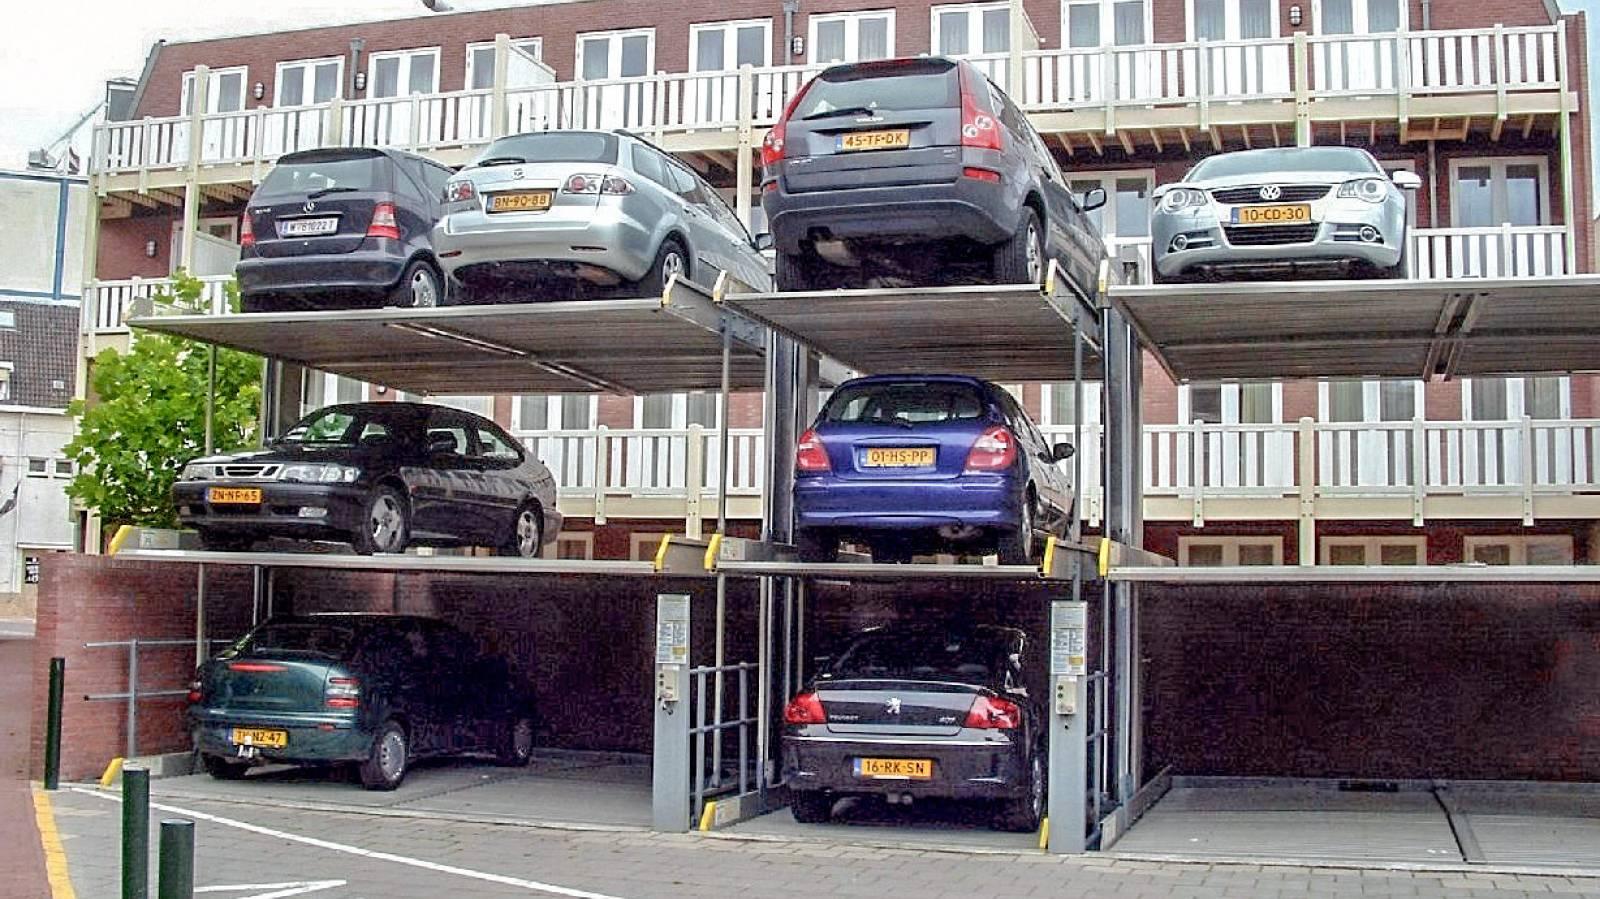 NEU_woehr-parklift413-carparkingsystem-autoparksystem-independentparking-7b7540a1